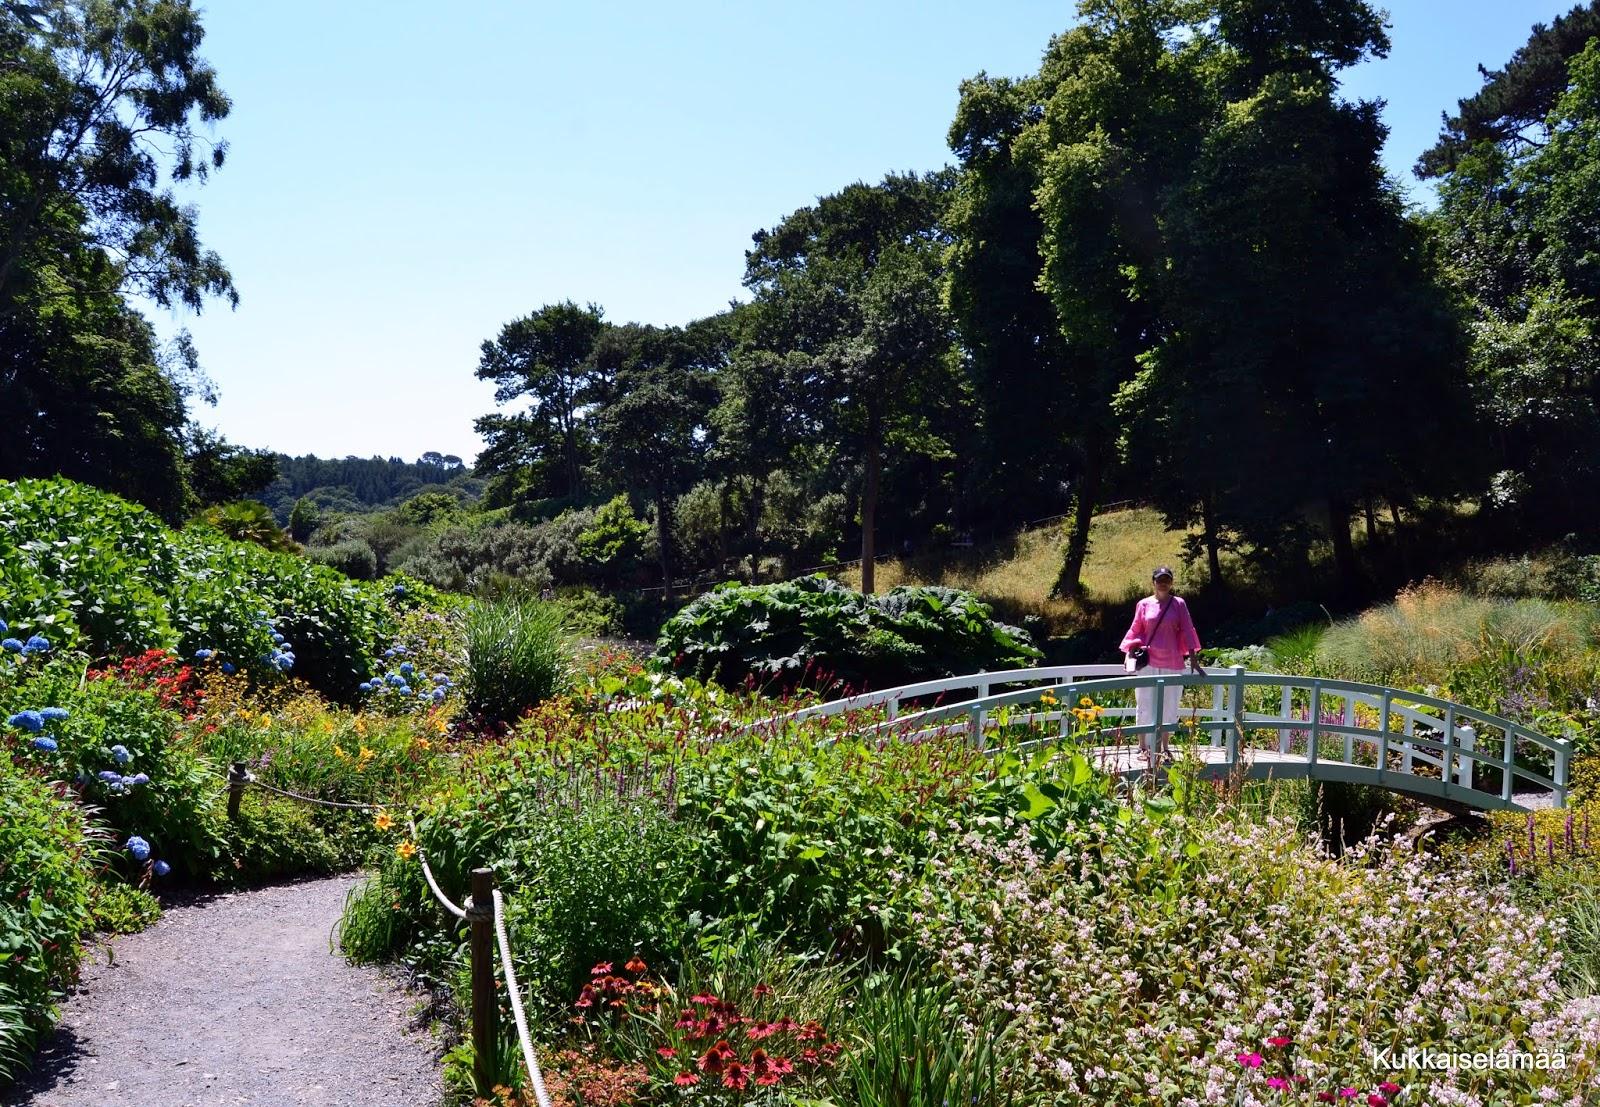 Trebah – ihan mieletön puutarha!